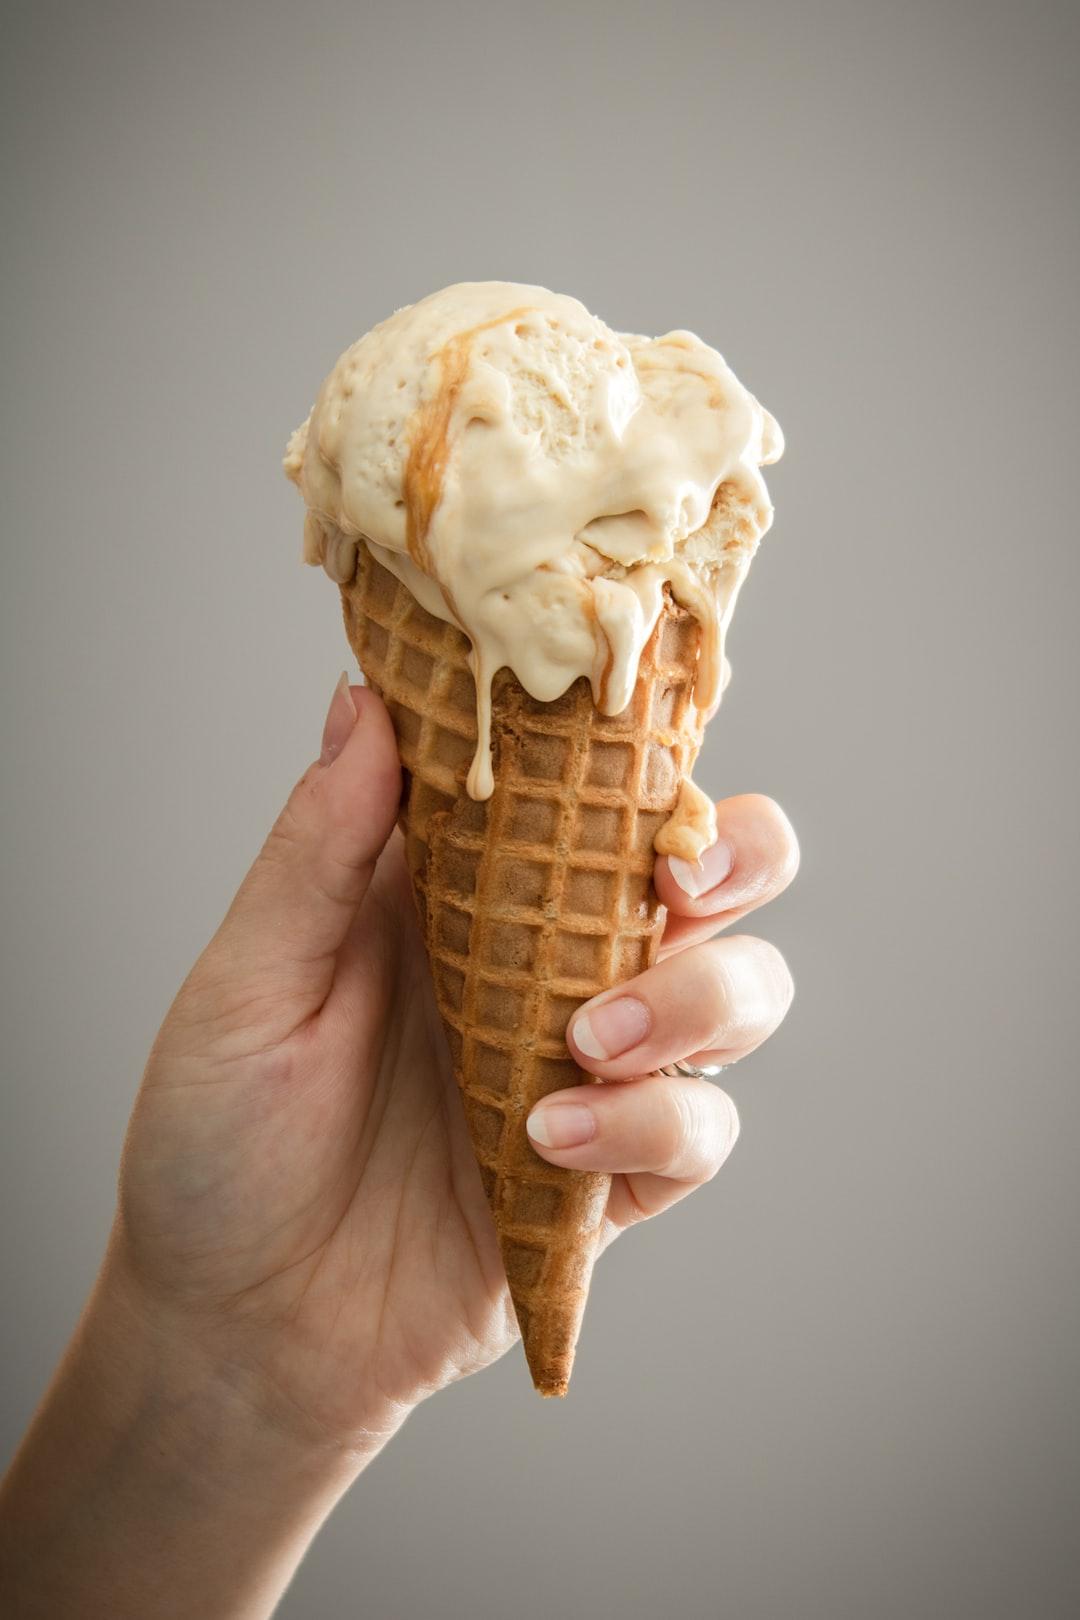 Melty caramel ice cream cone